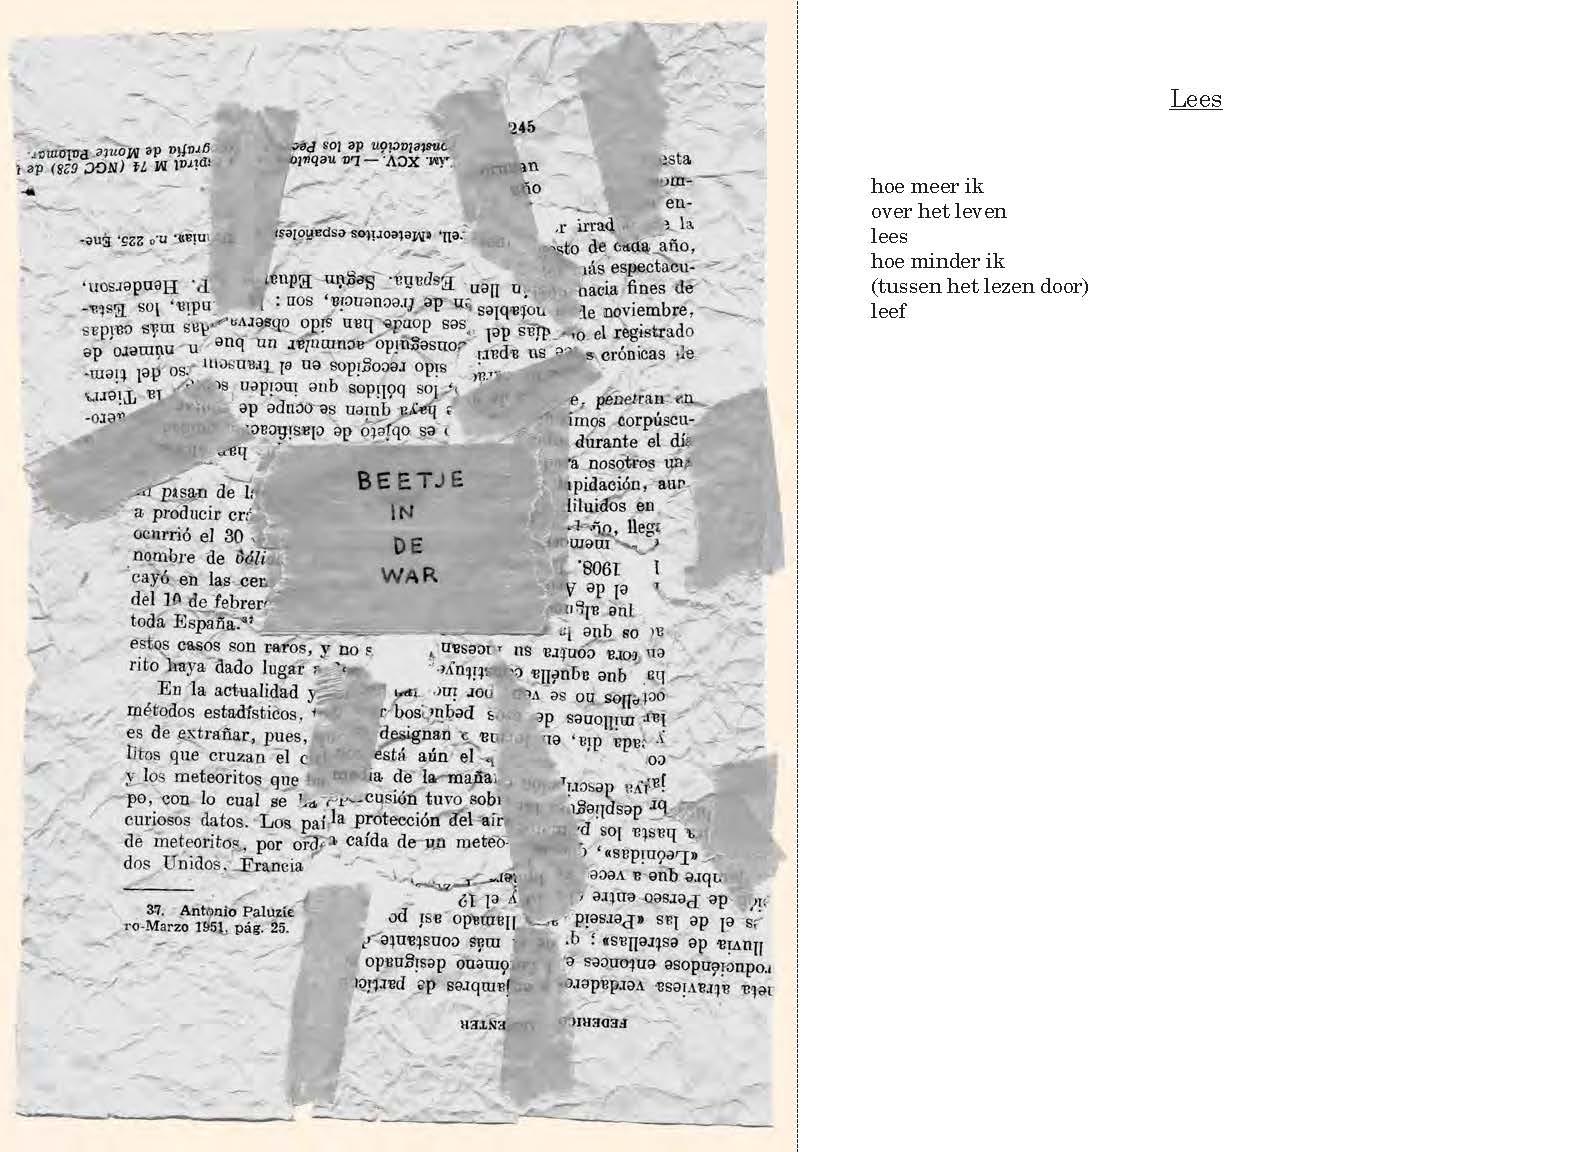 Manuscript-Selfie-YildauterBeek-Lang_Pagina_39.jpg